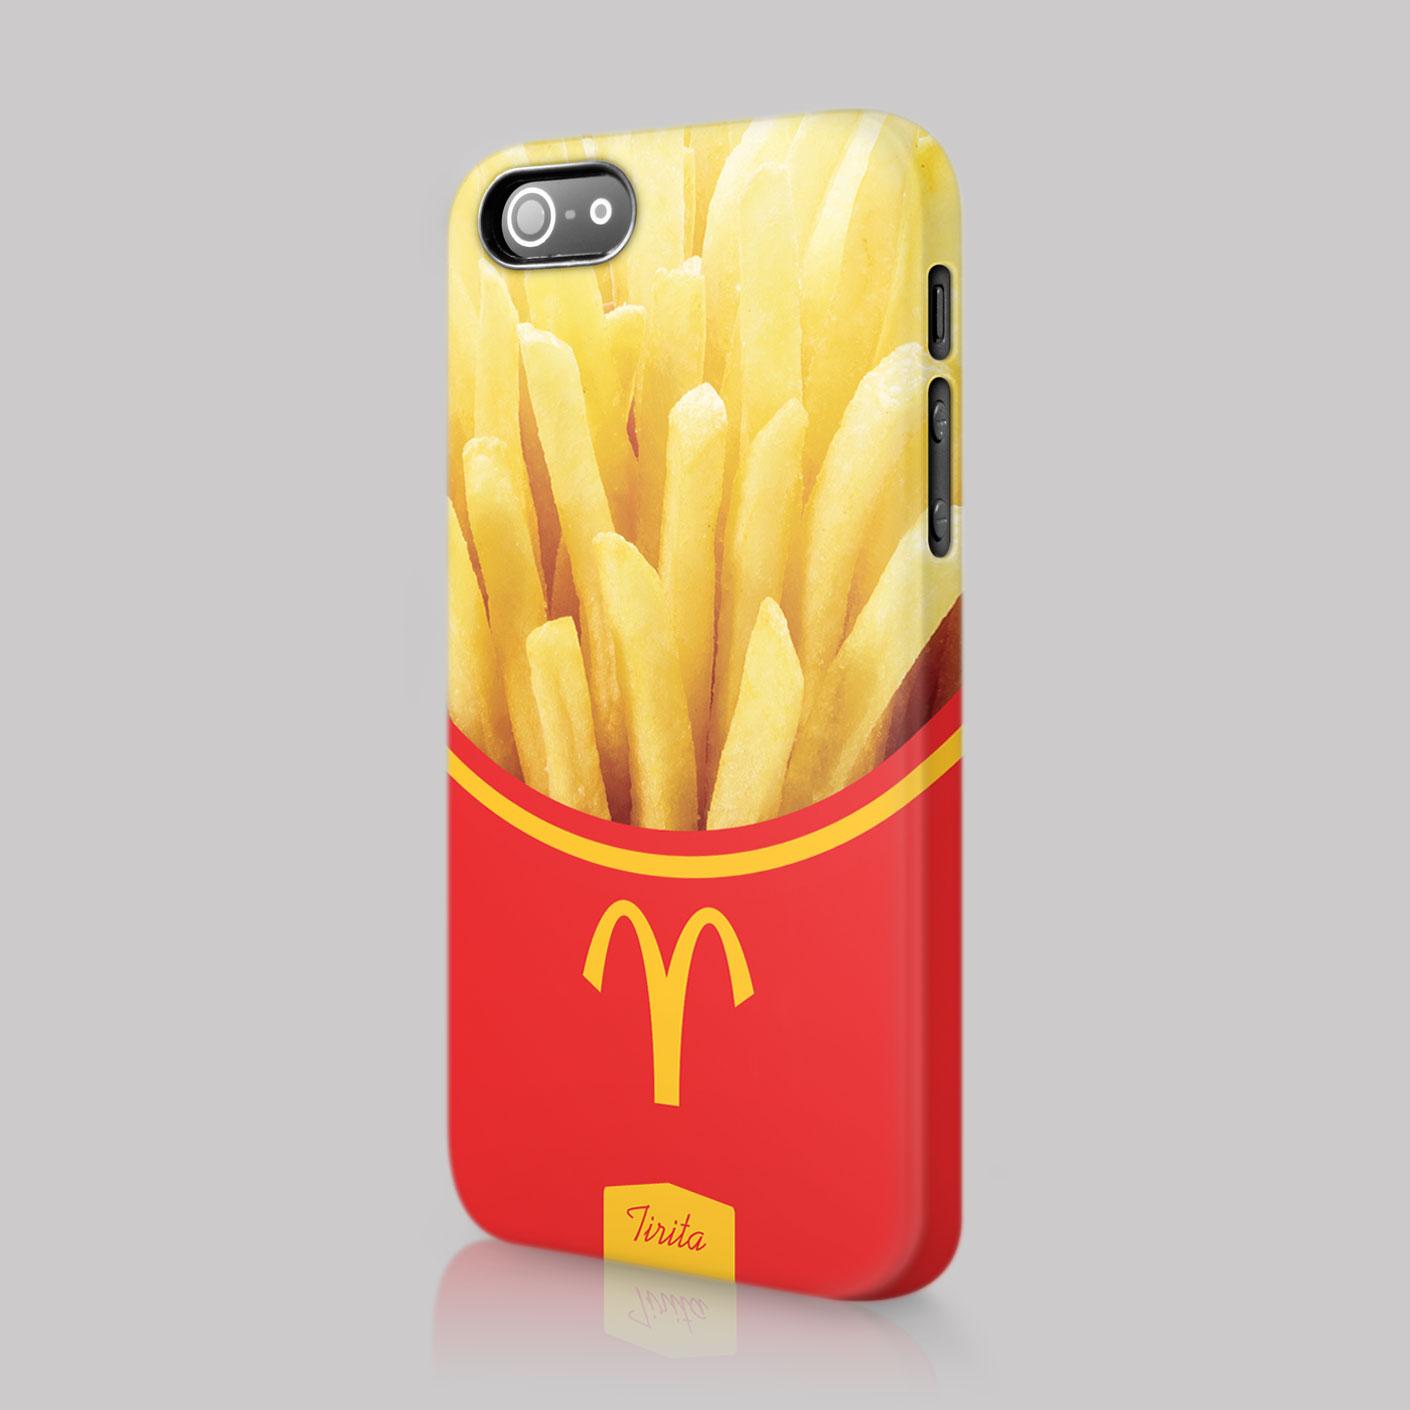 ... Fast Food Burger Fries Case Hard Cover For iPhone 4 5 6 7 u0026 SE : eBay